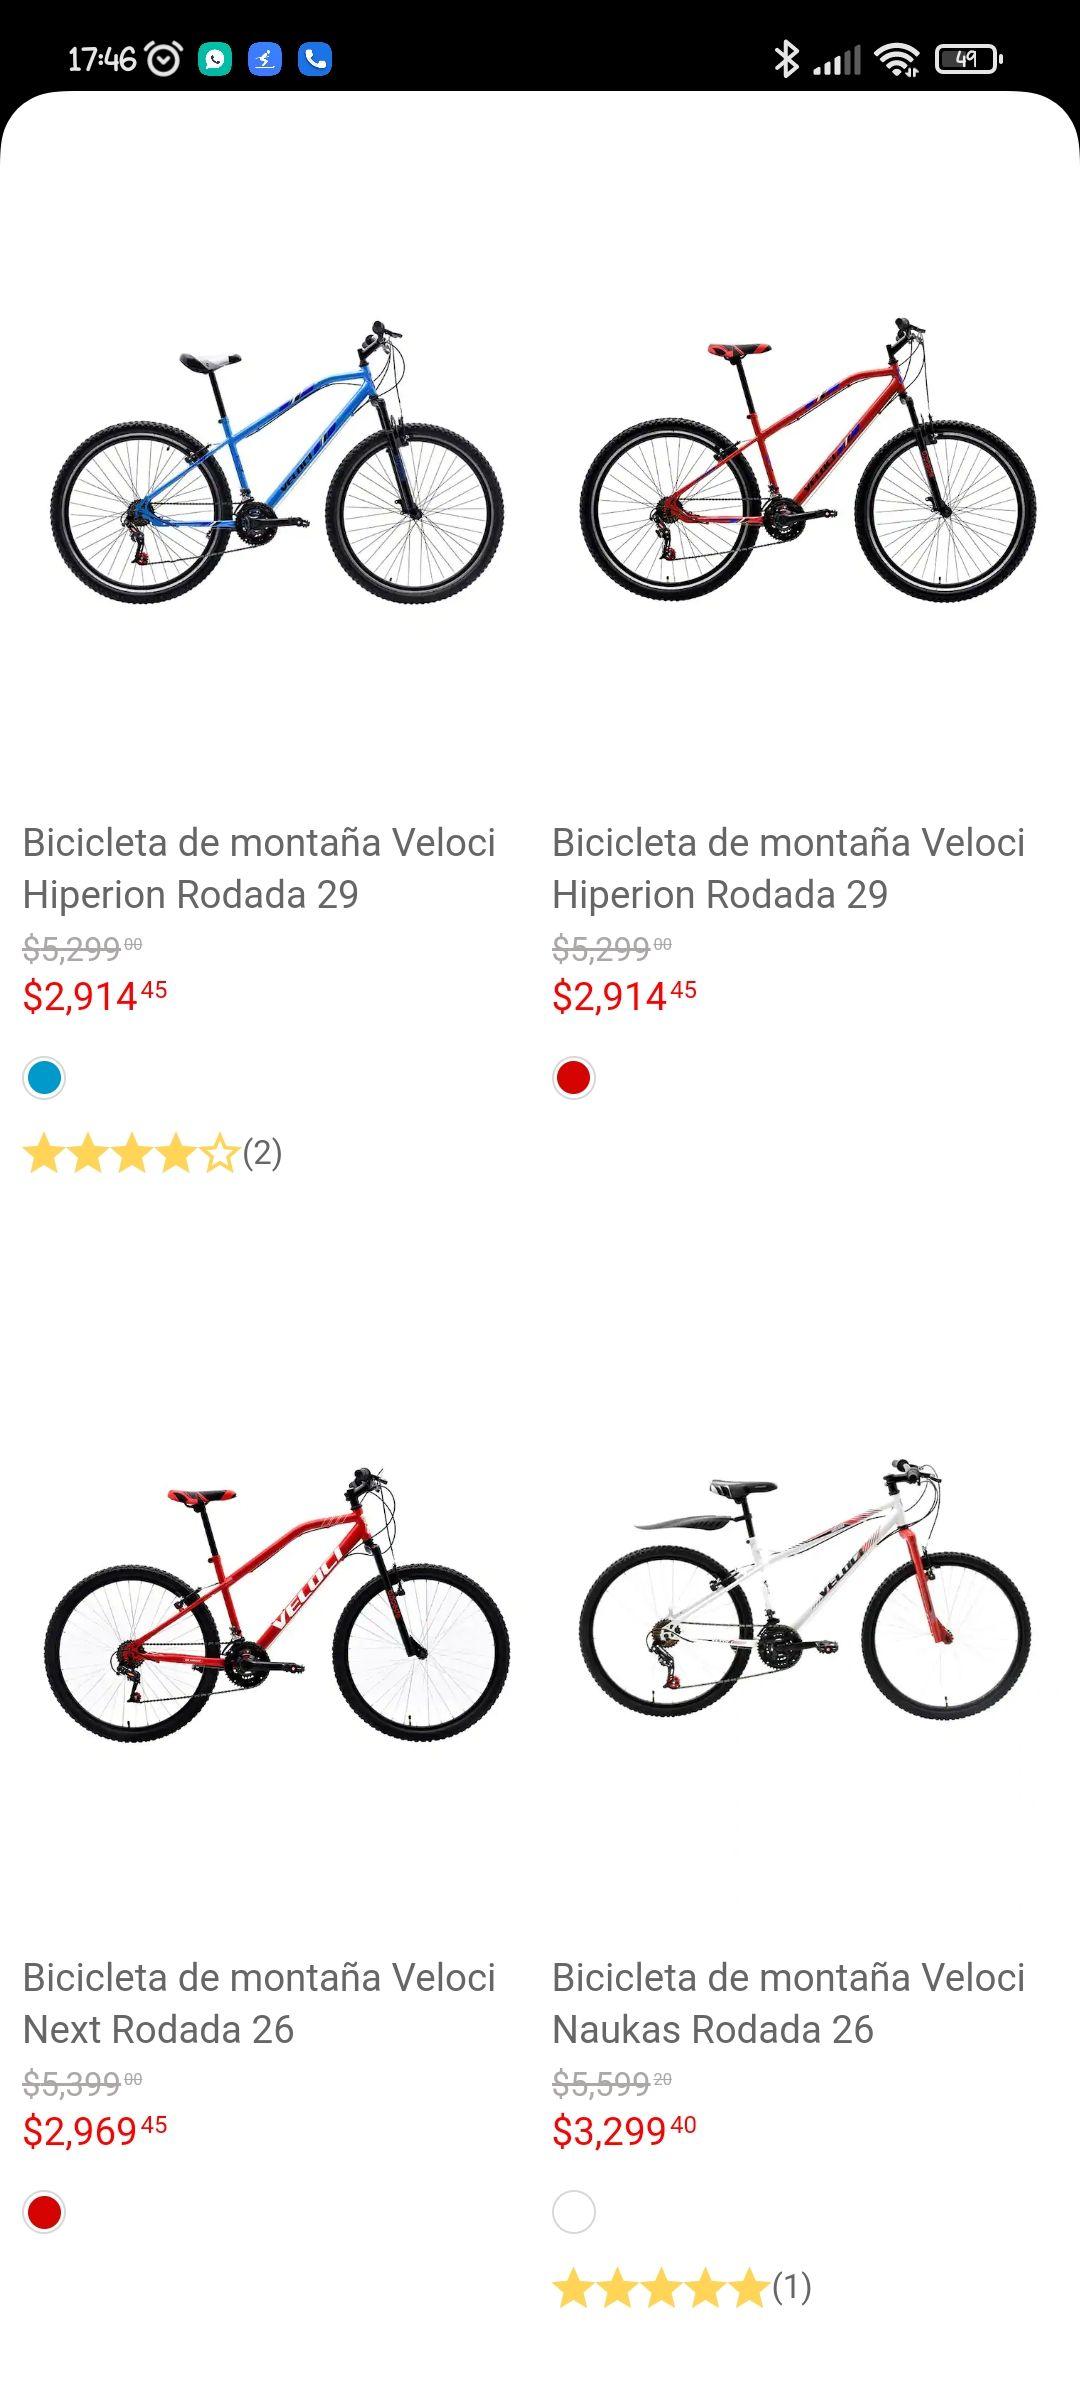 Liverpool: Bicicletas Veloci En descuento